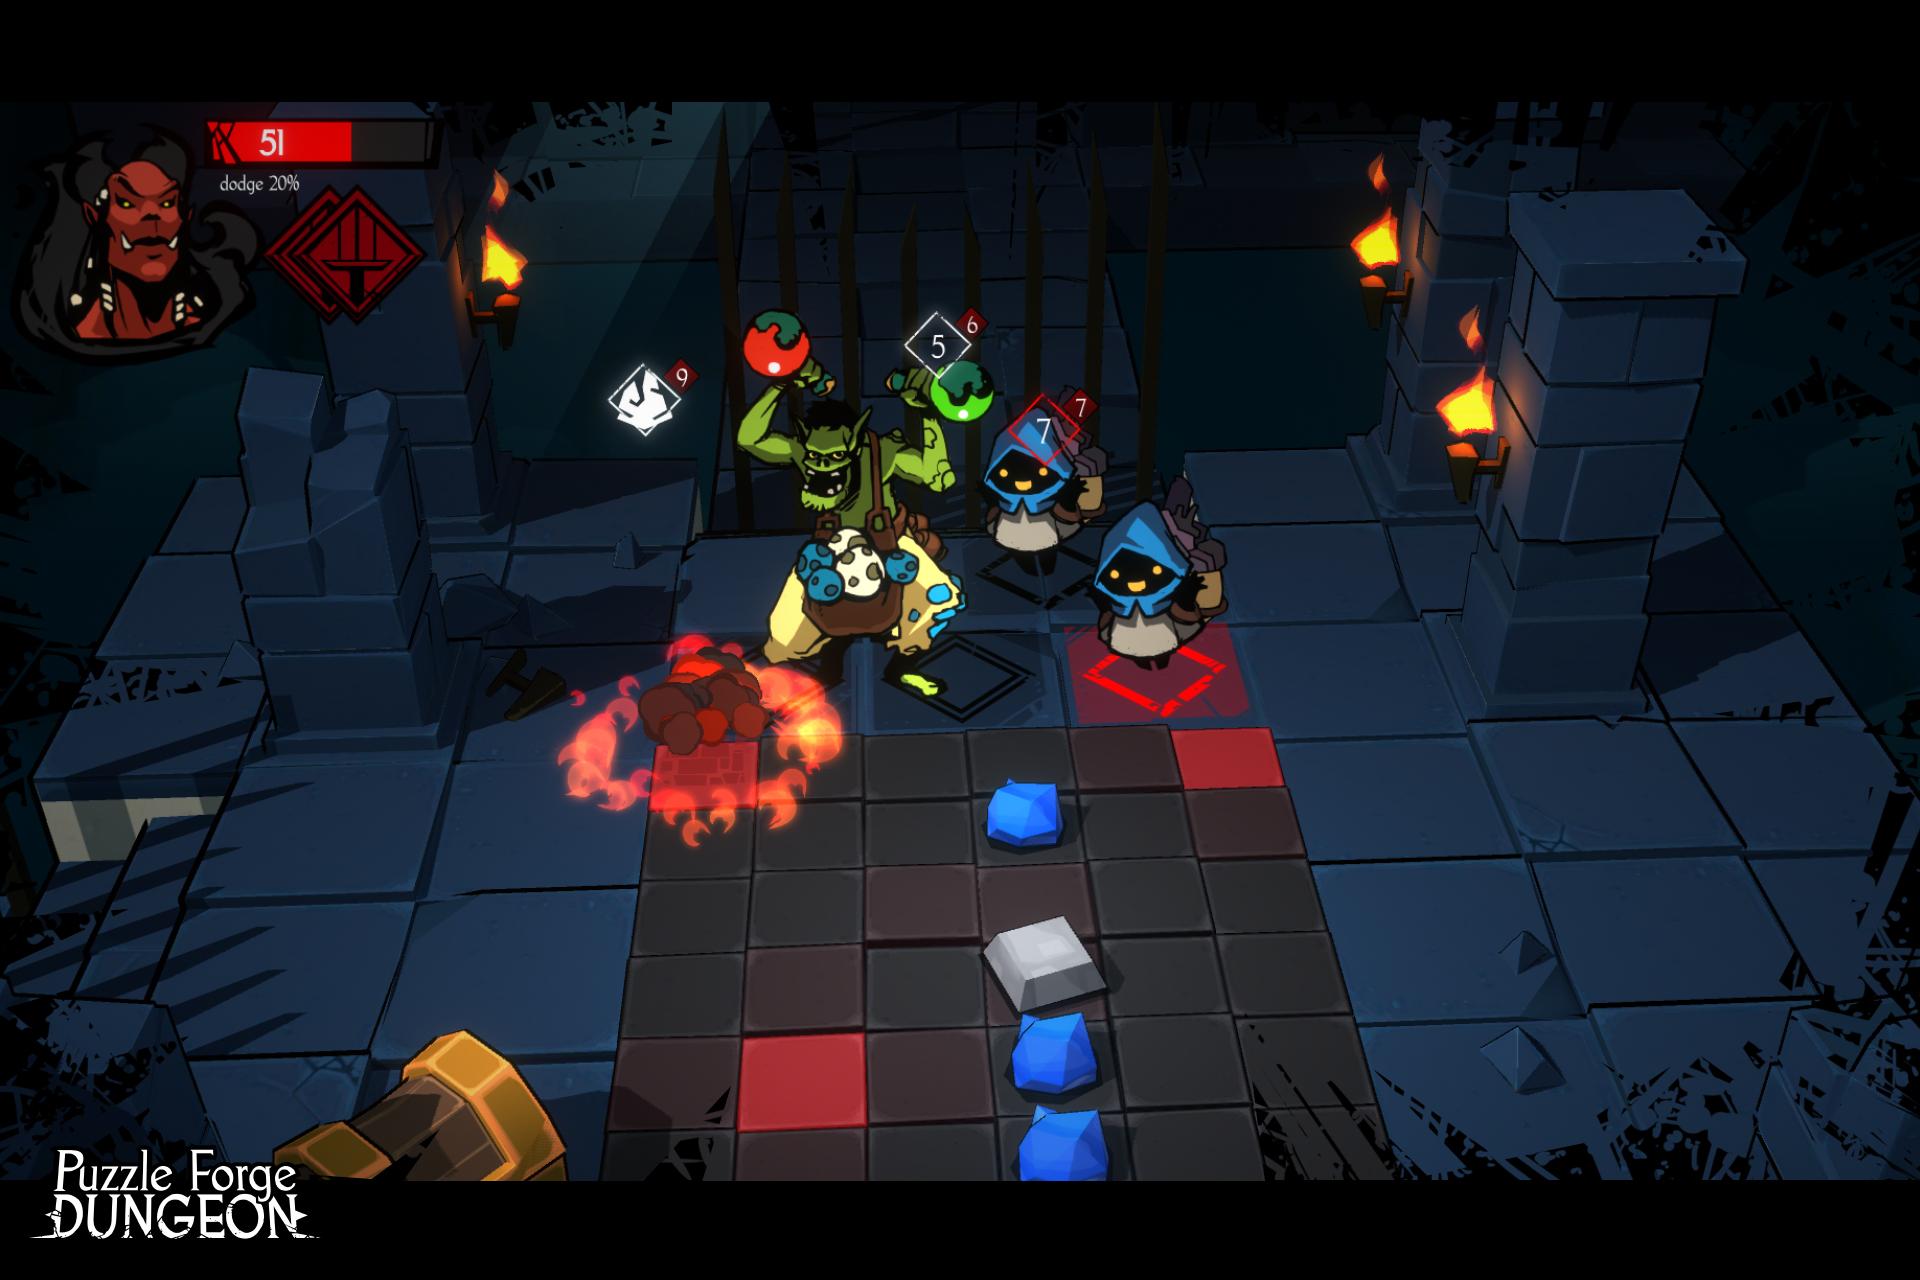 images/games/pfd/sreenshot2.jpg